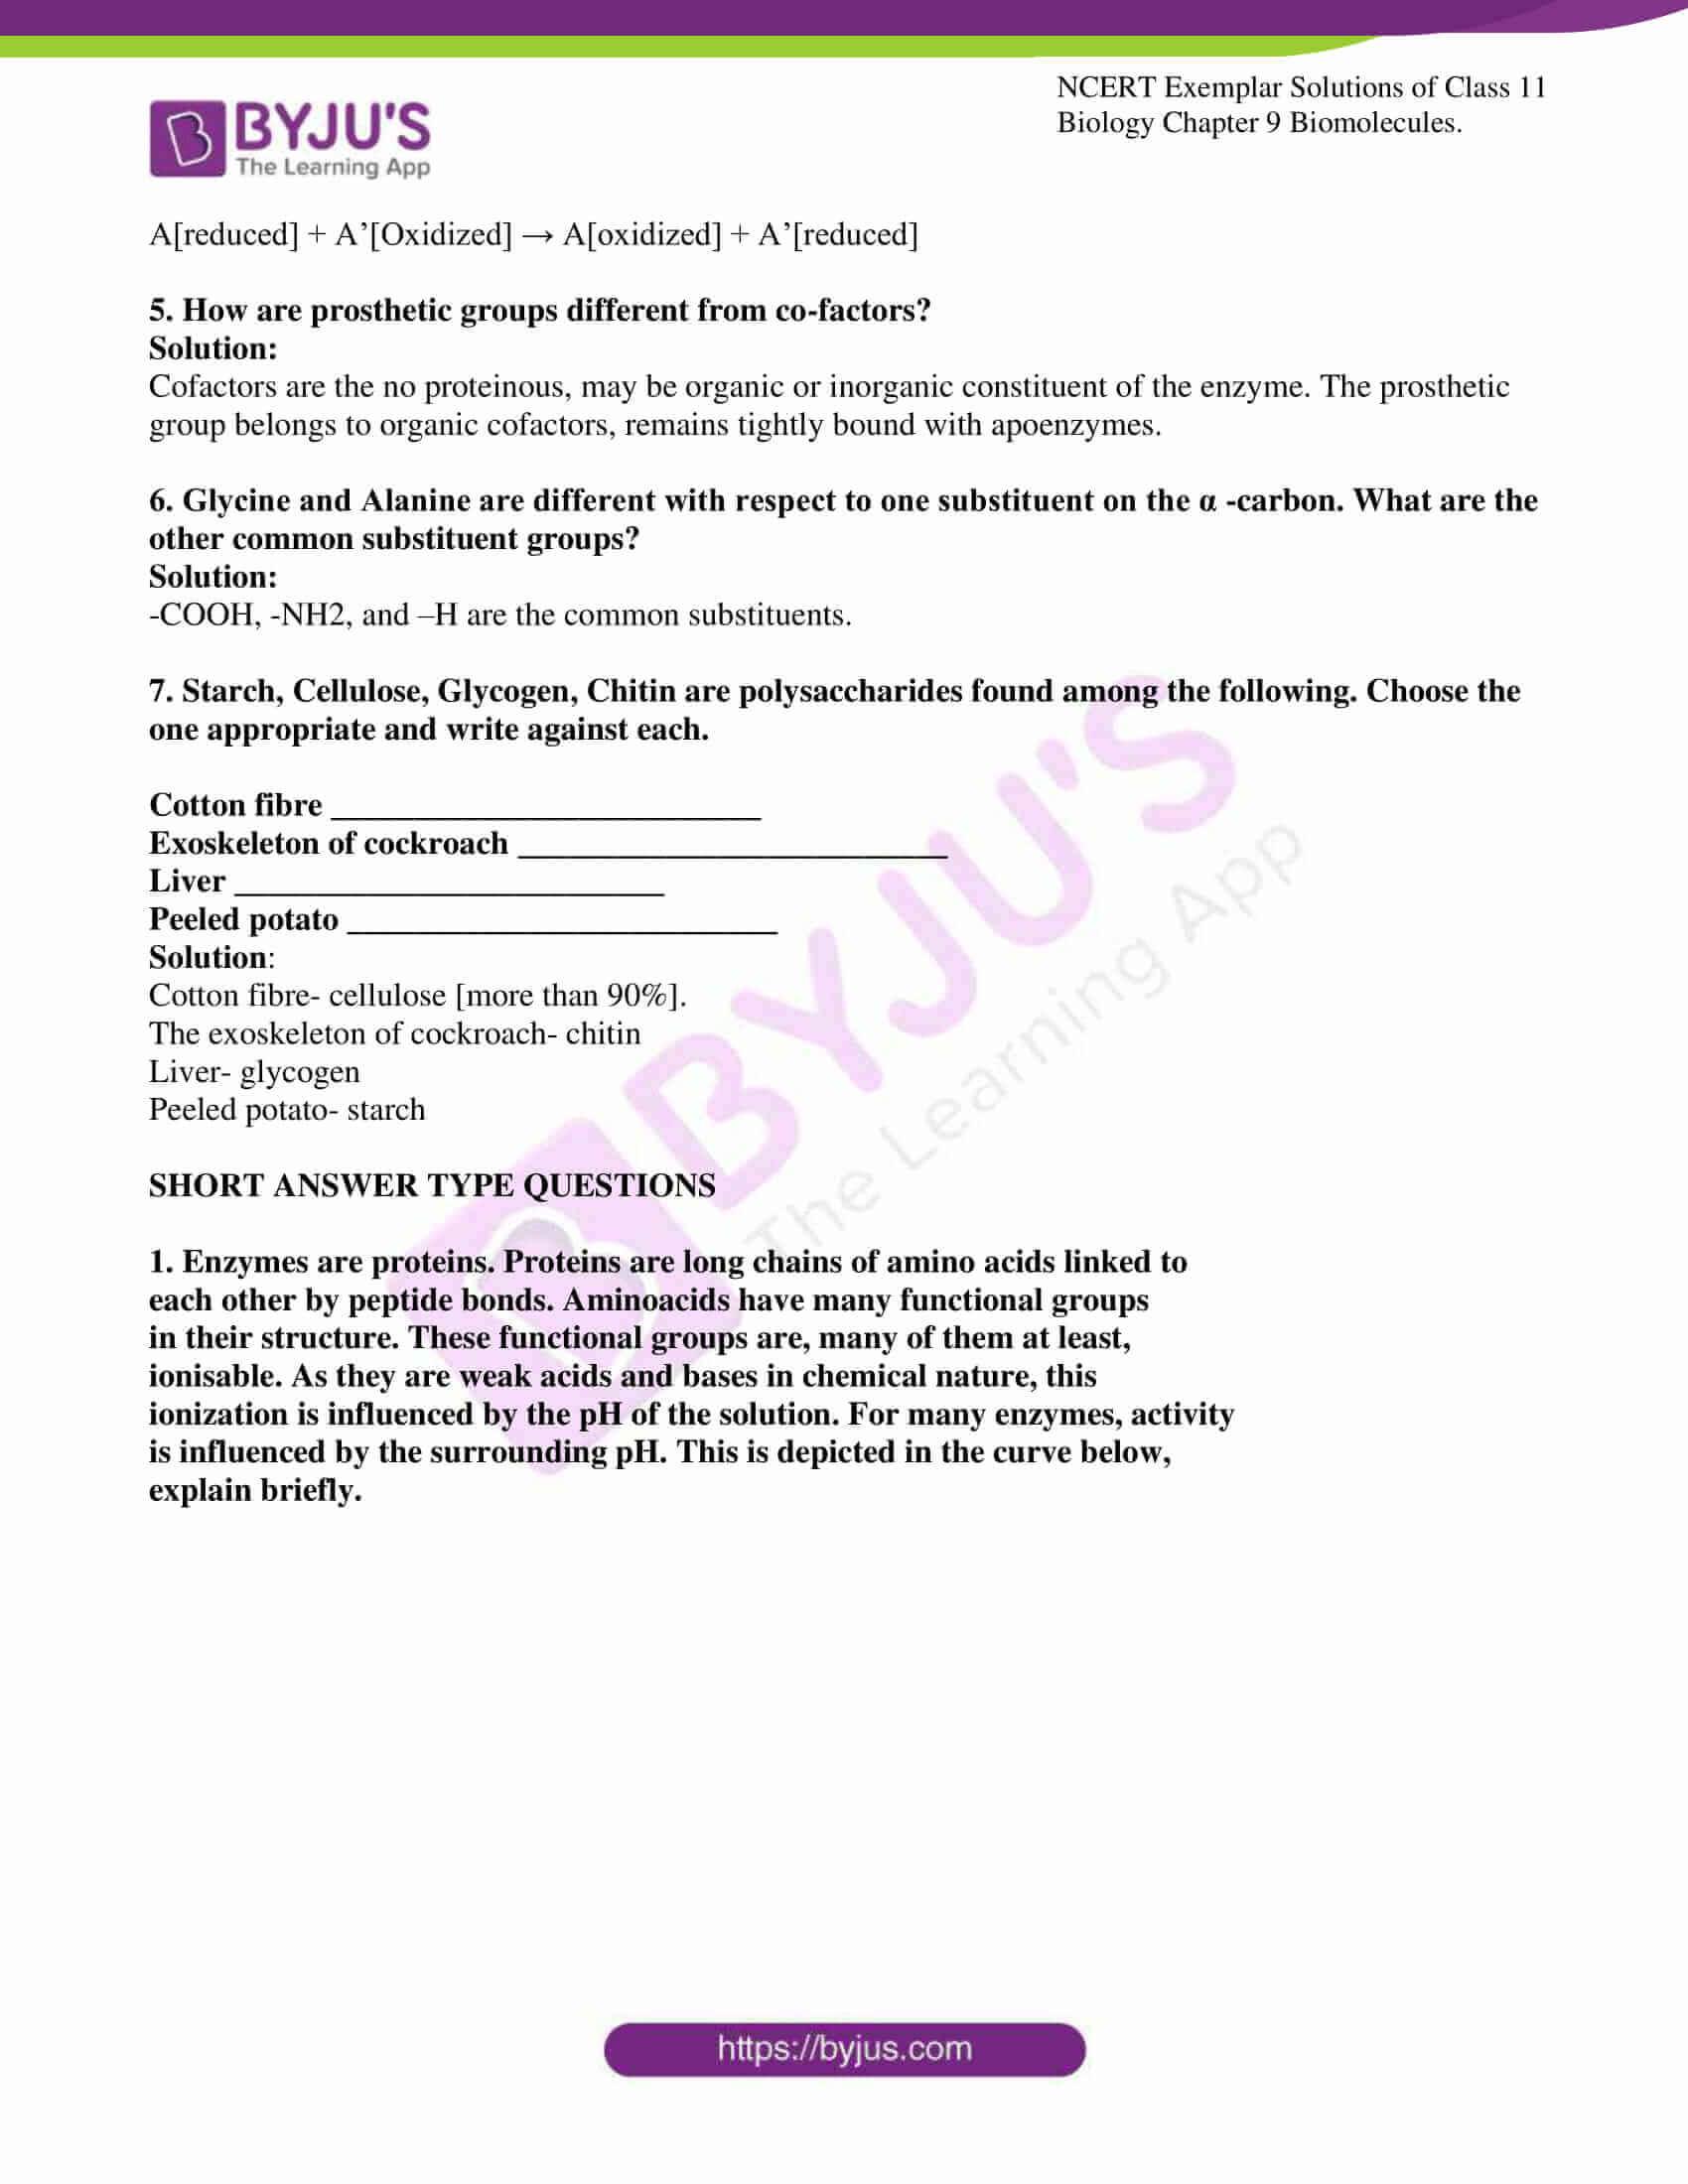 ncert exemplar solutions for class 11 bio chapter 9 5